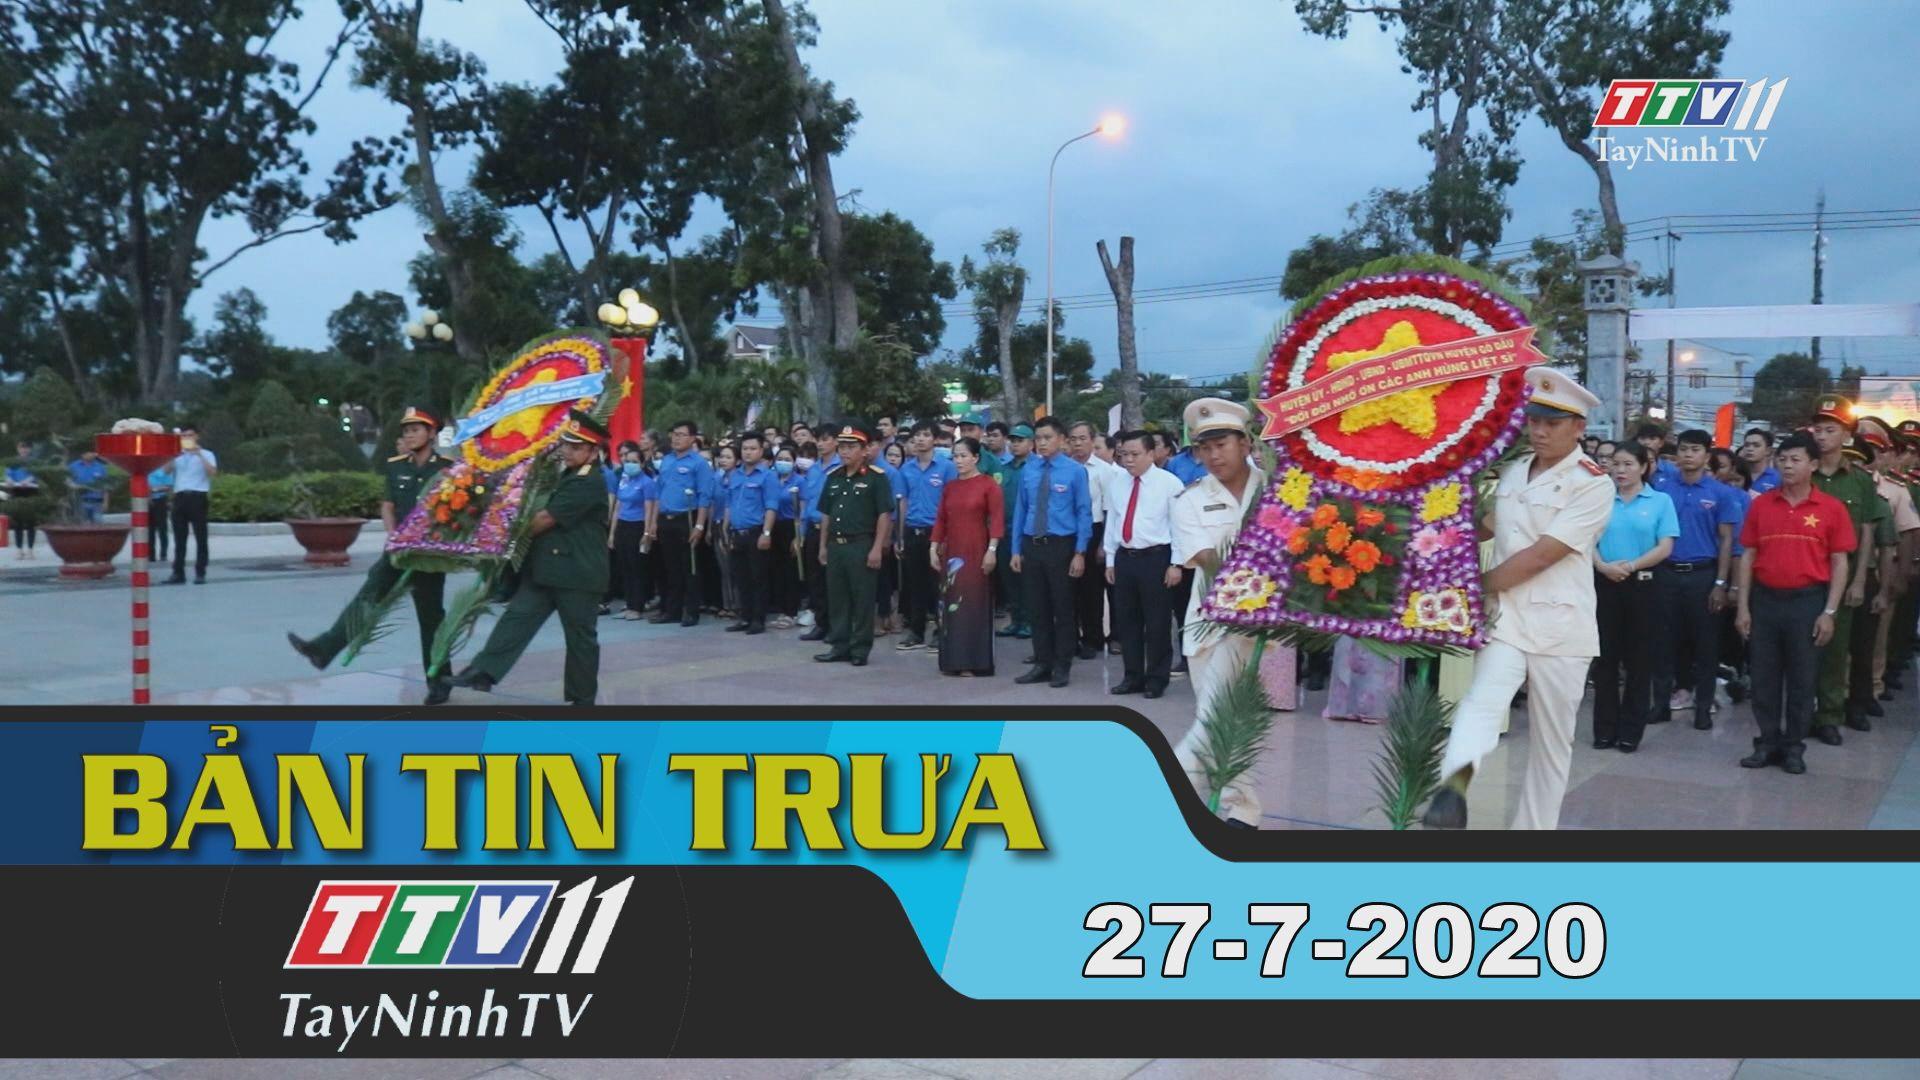 Bản tin trưa 27-7-2020 | Tin tức hôm nay | TayNinhTV